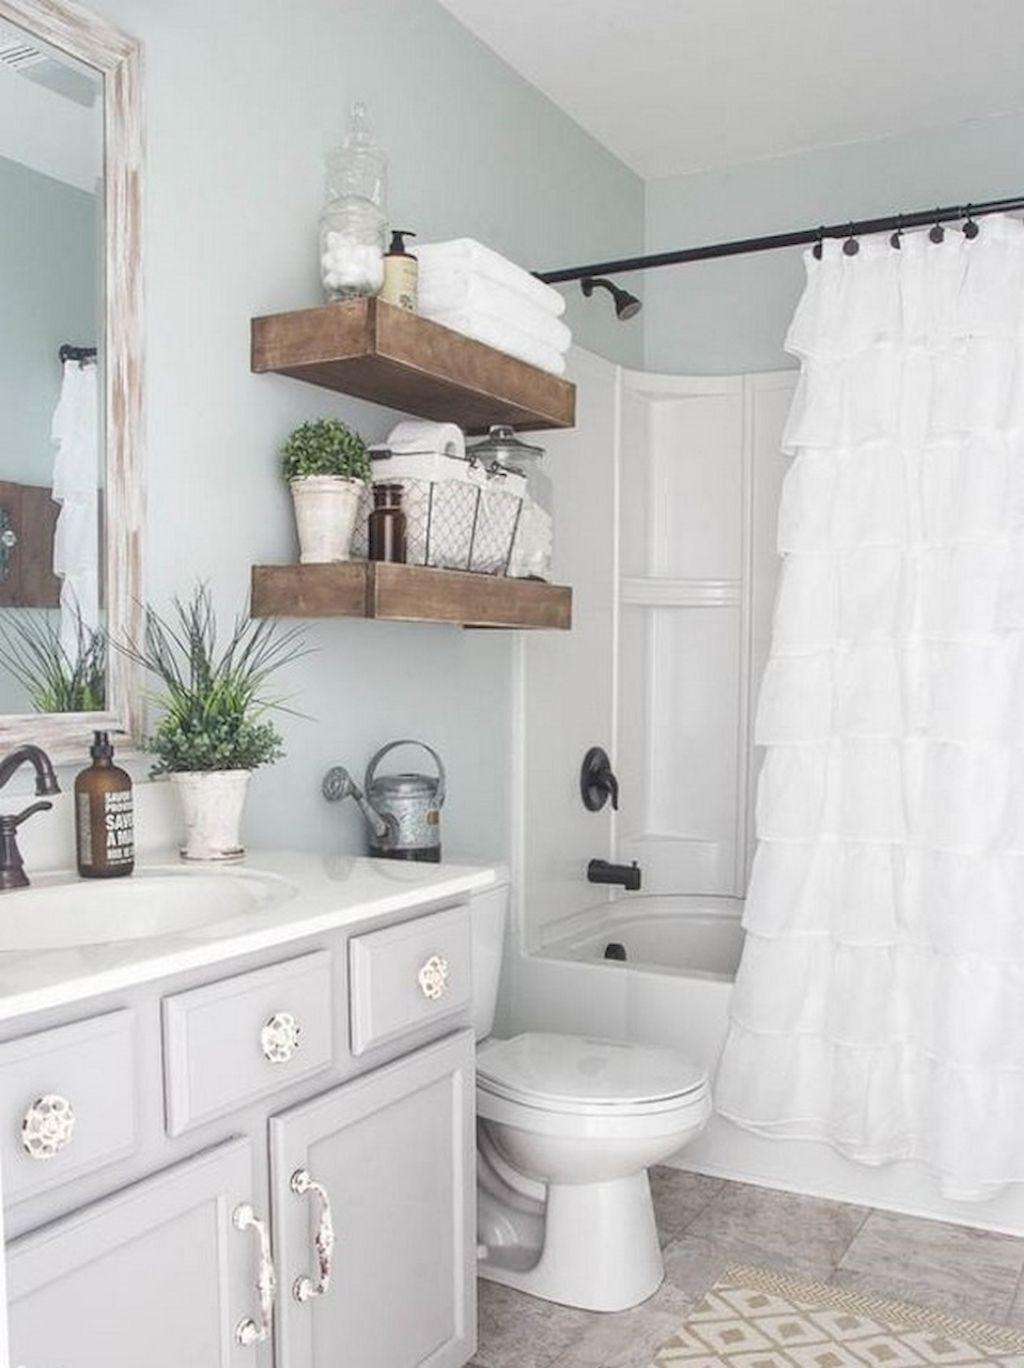 150 stunning small farmhouse bathroom decor ideas and remoddel to rh pinterest com